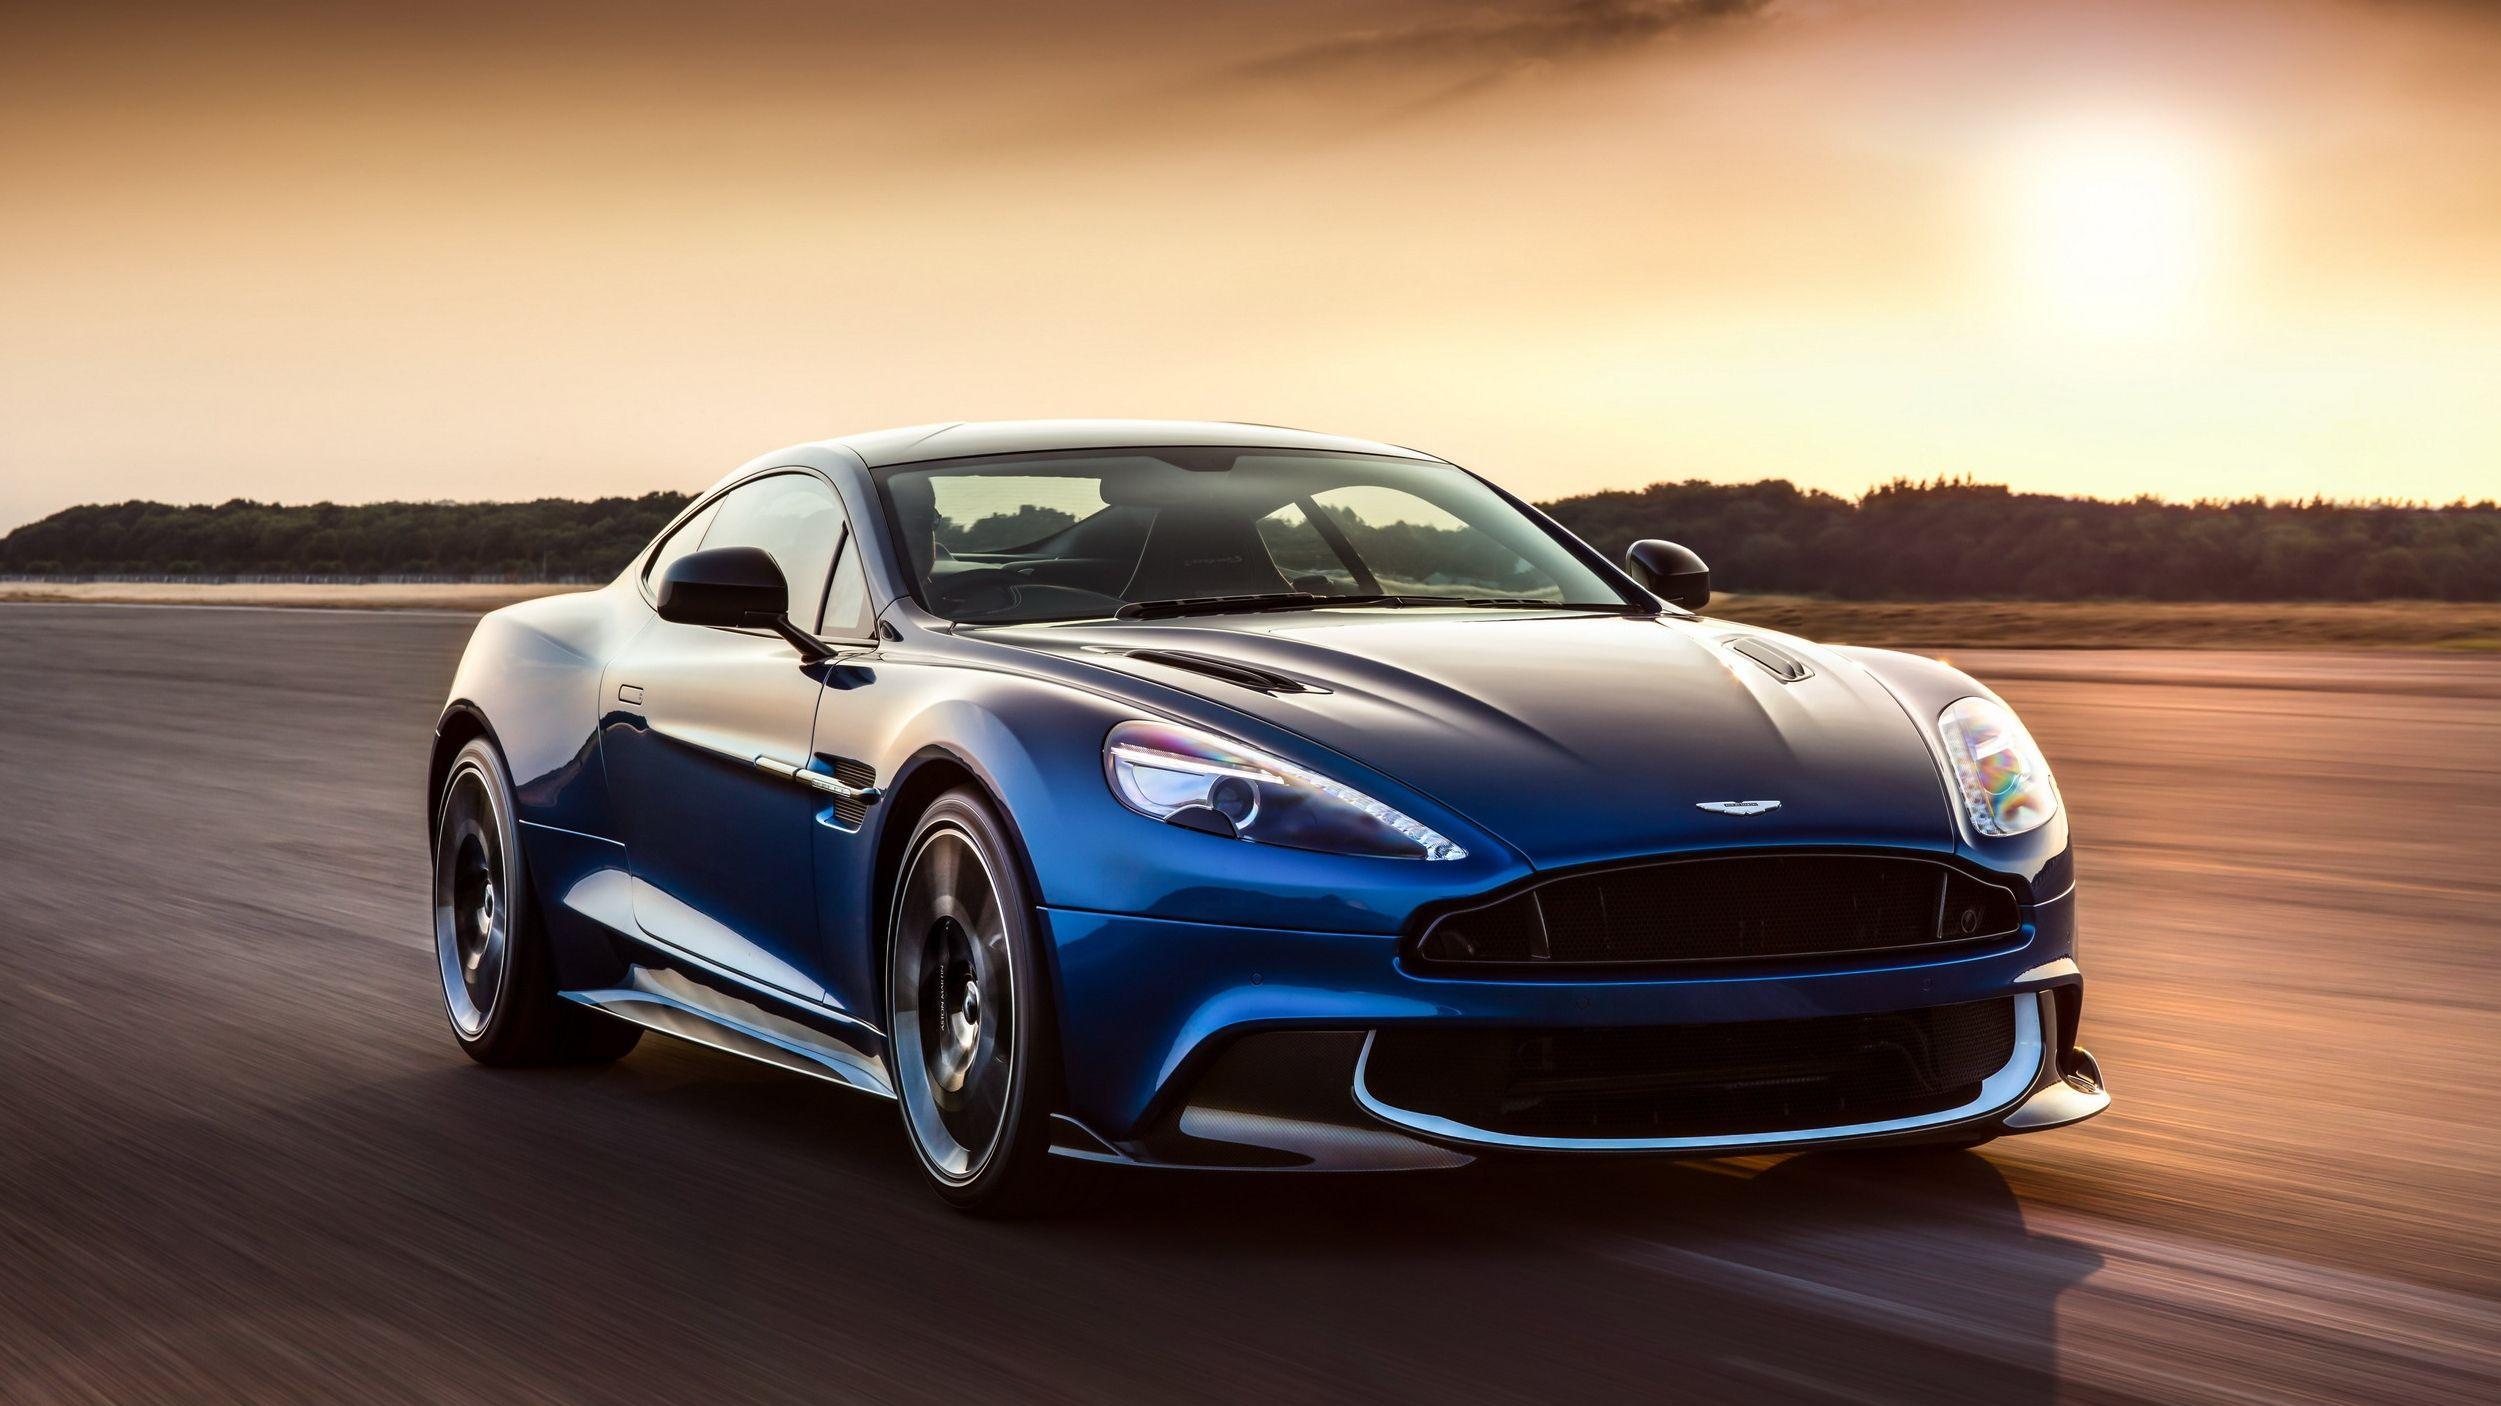 Aston Martin Vanquish Wallpapers Top Free Aston Martin Vanquish Backgrounds Wallpaperaccess